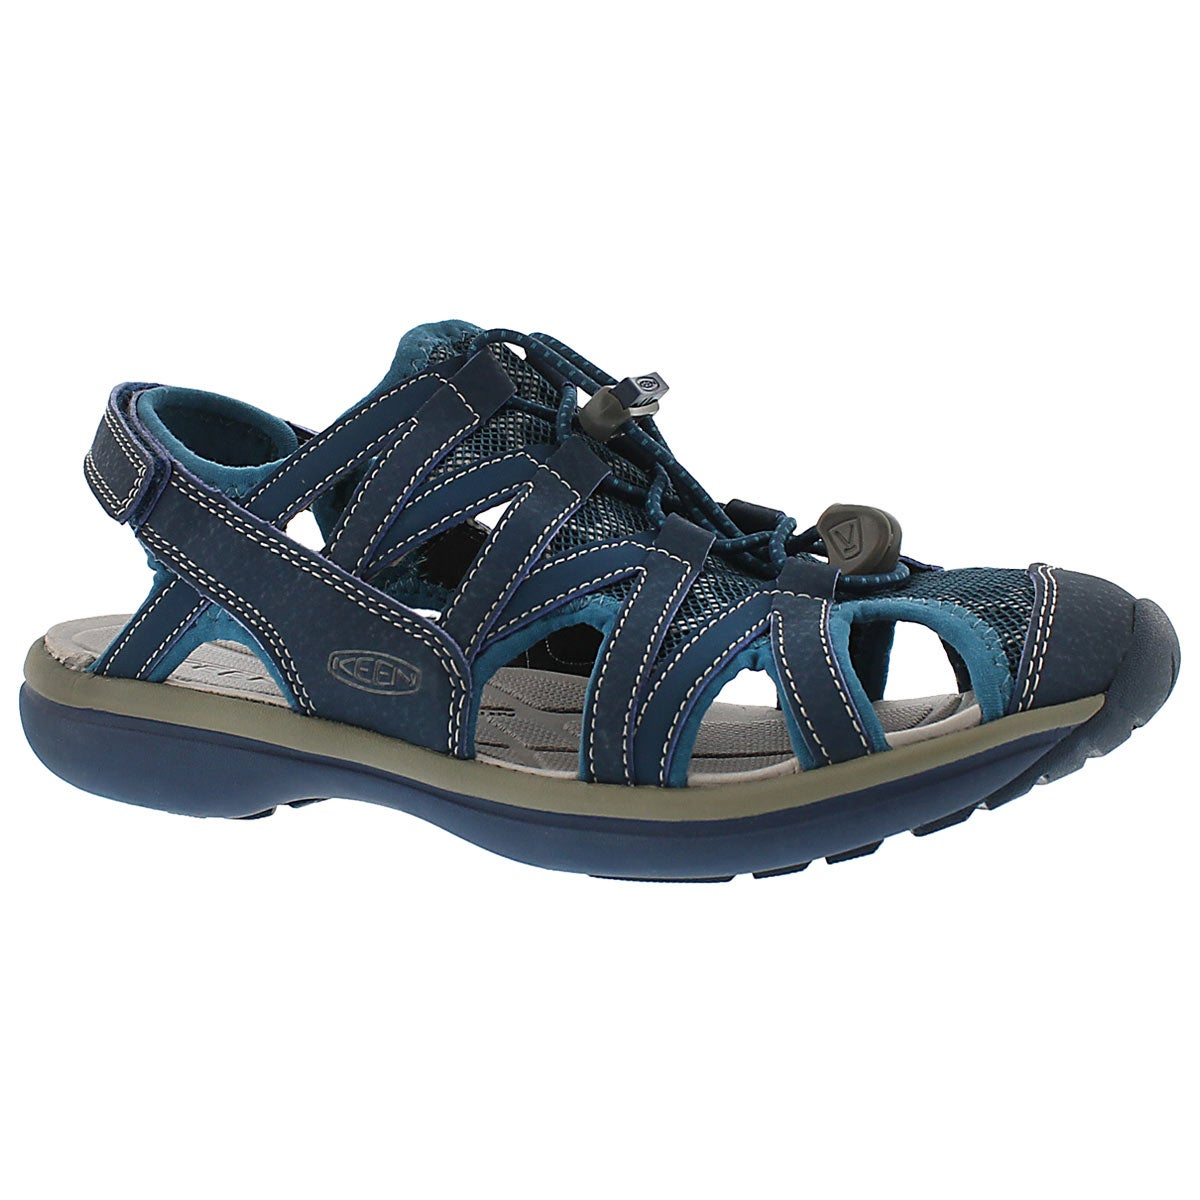 Sandale sport Sage, pos�idon, femmes